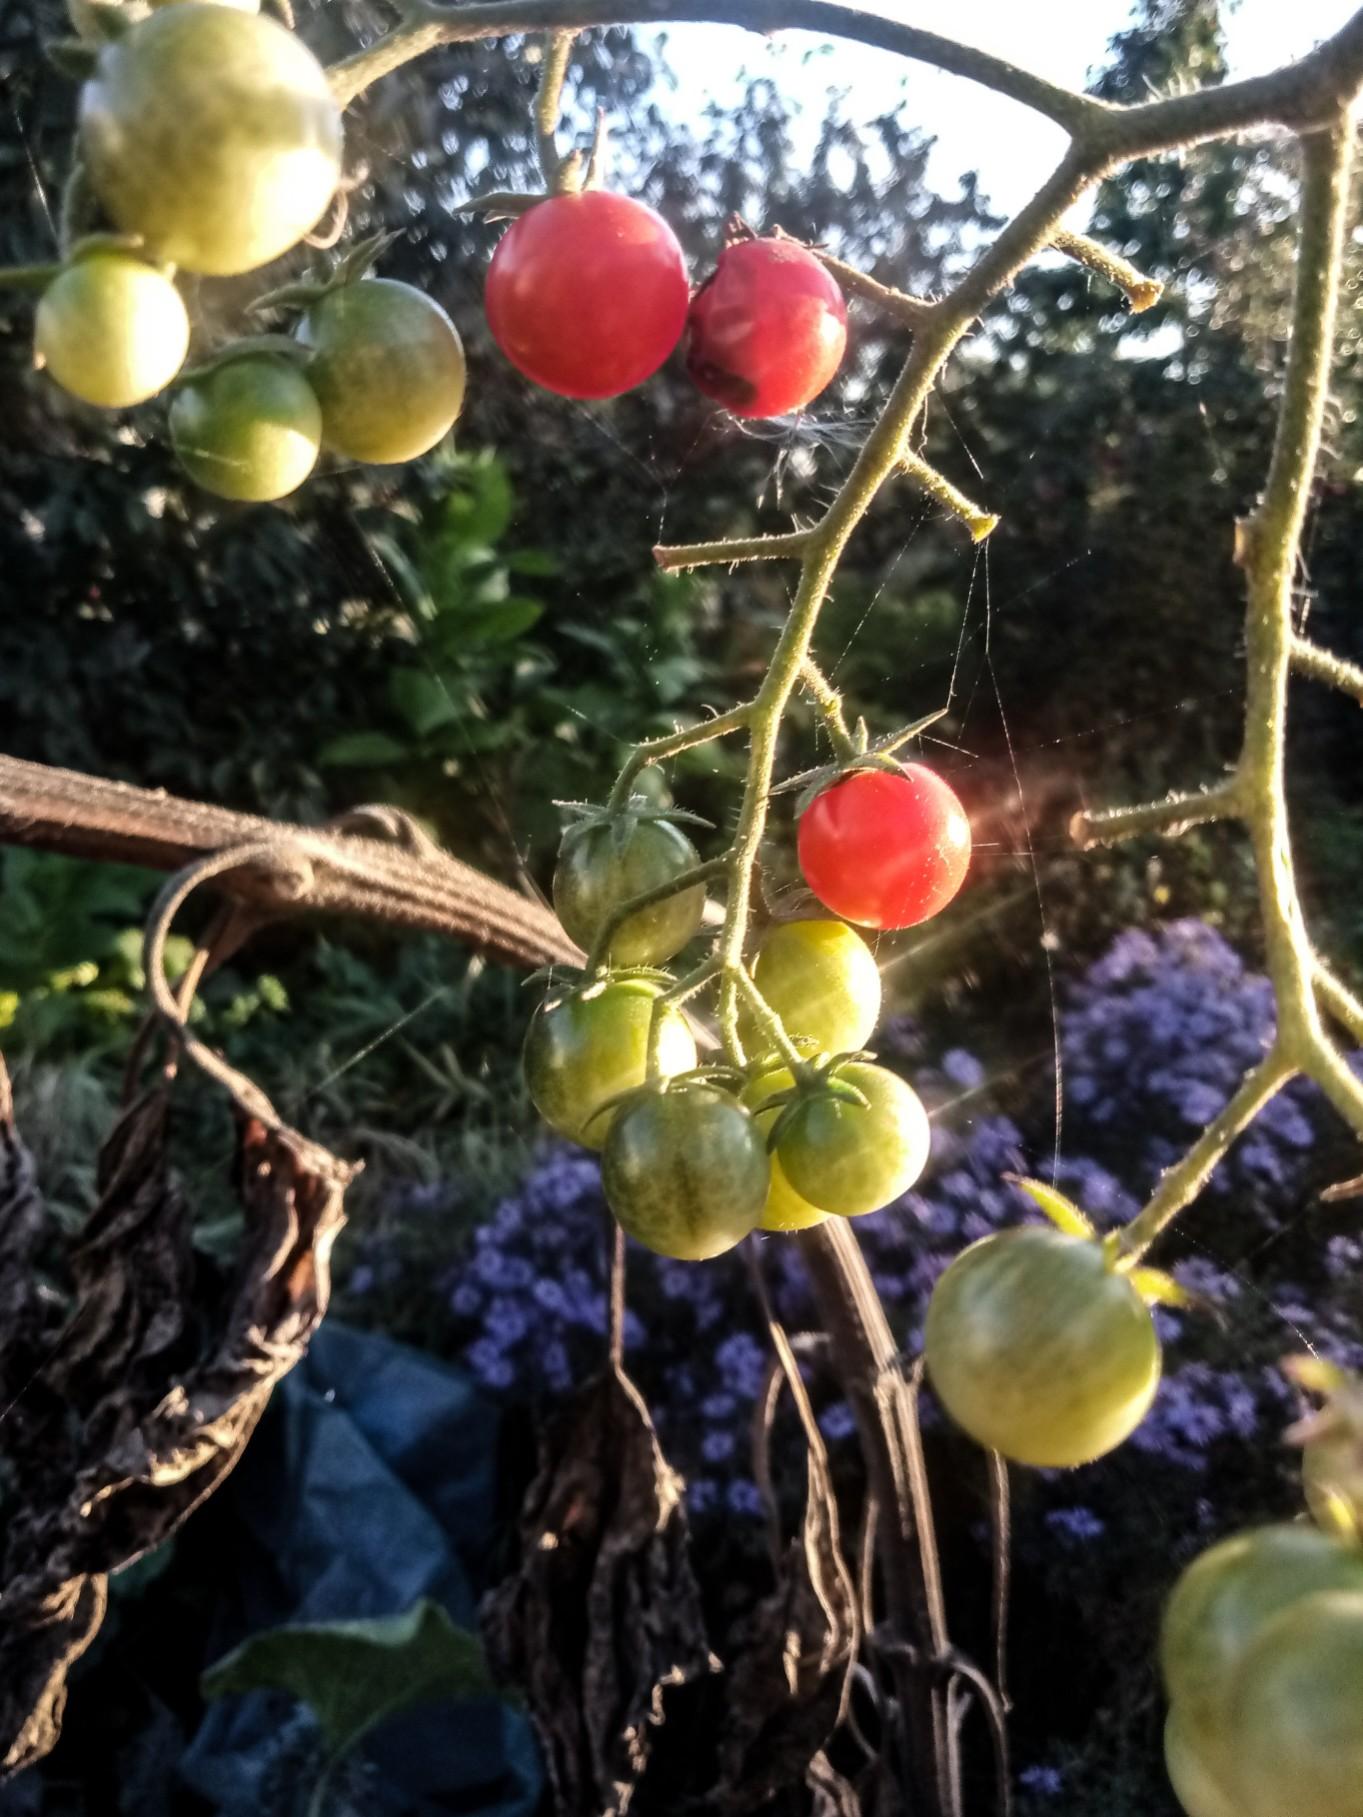 Cherry tomatoes photo 9